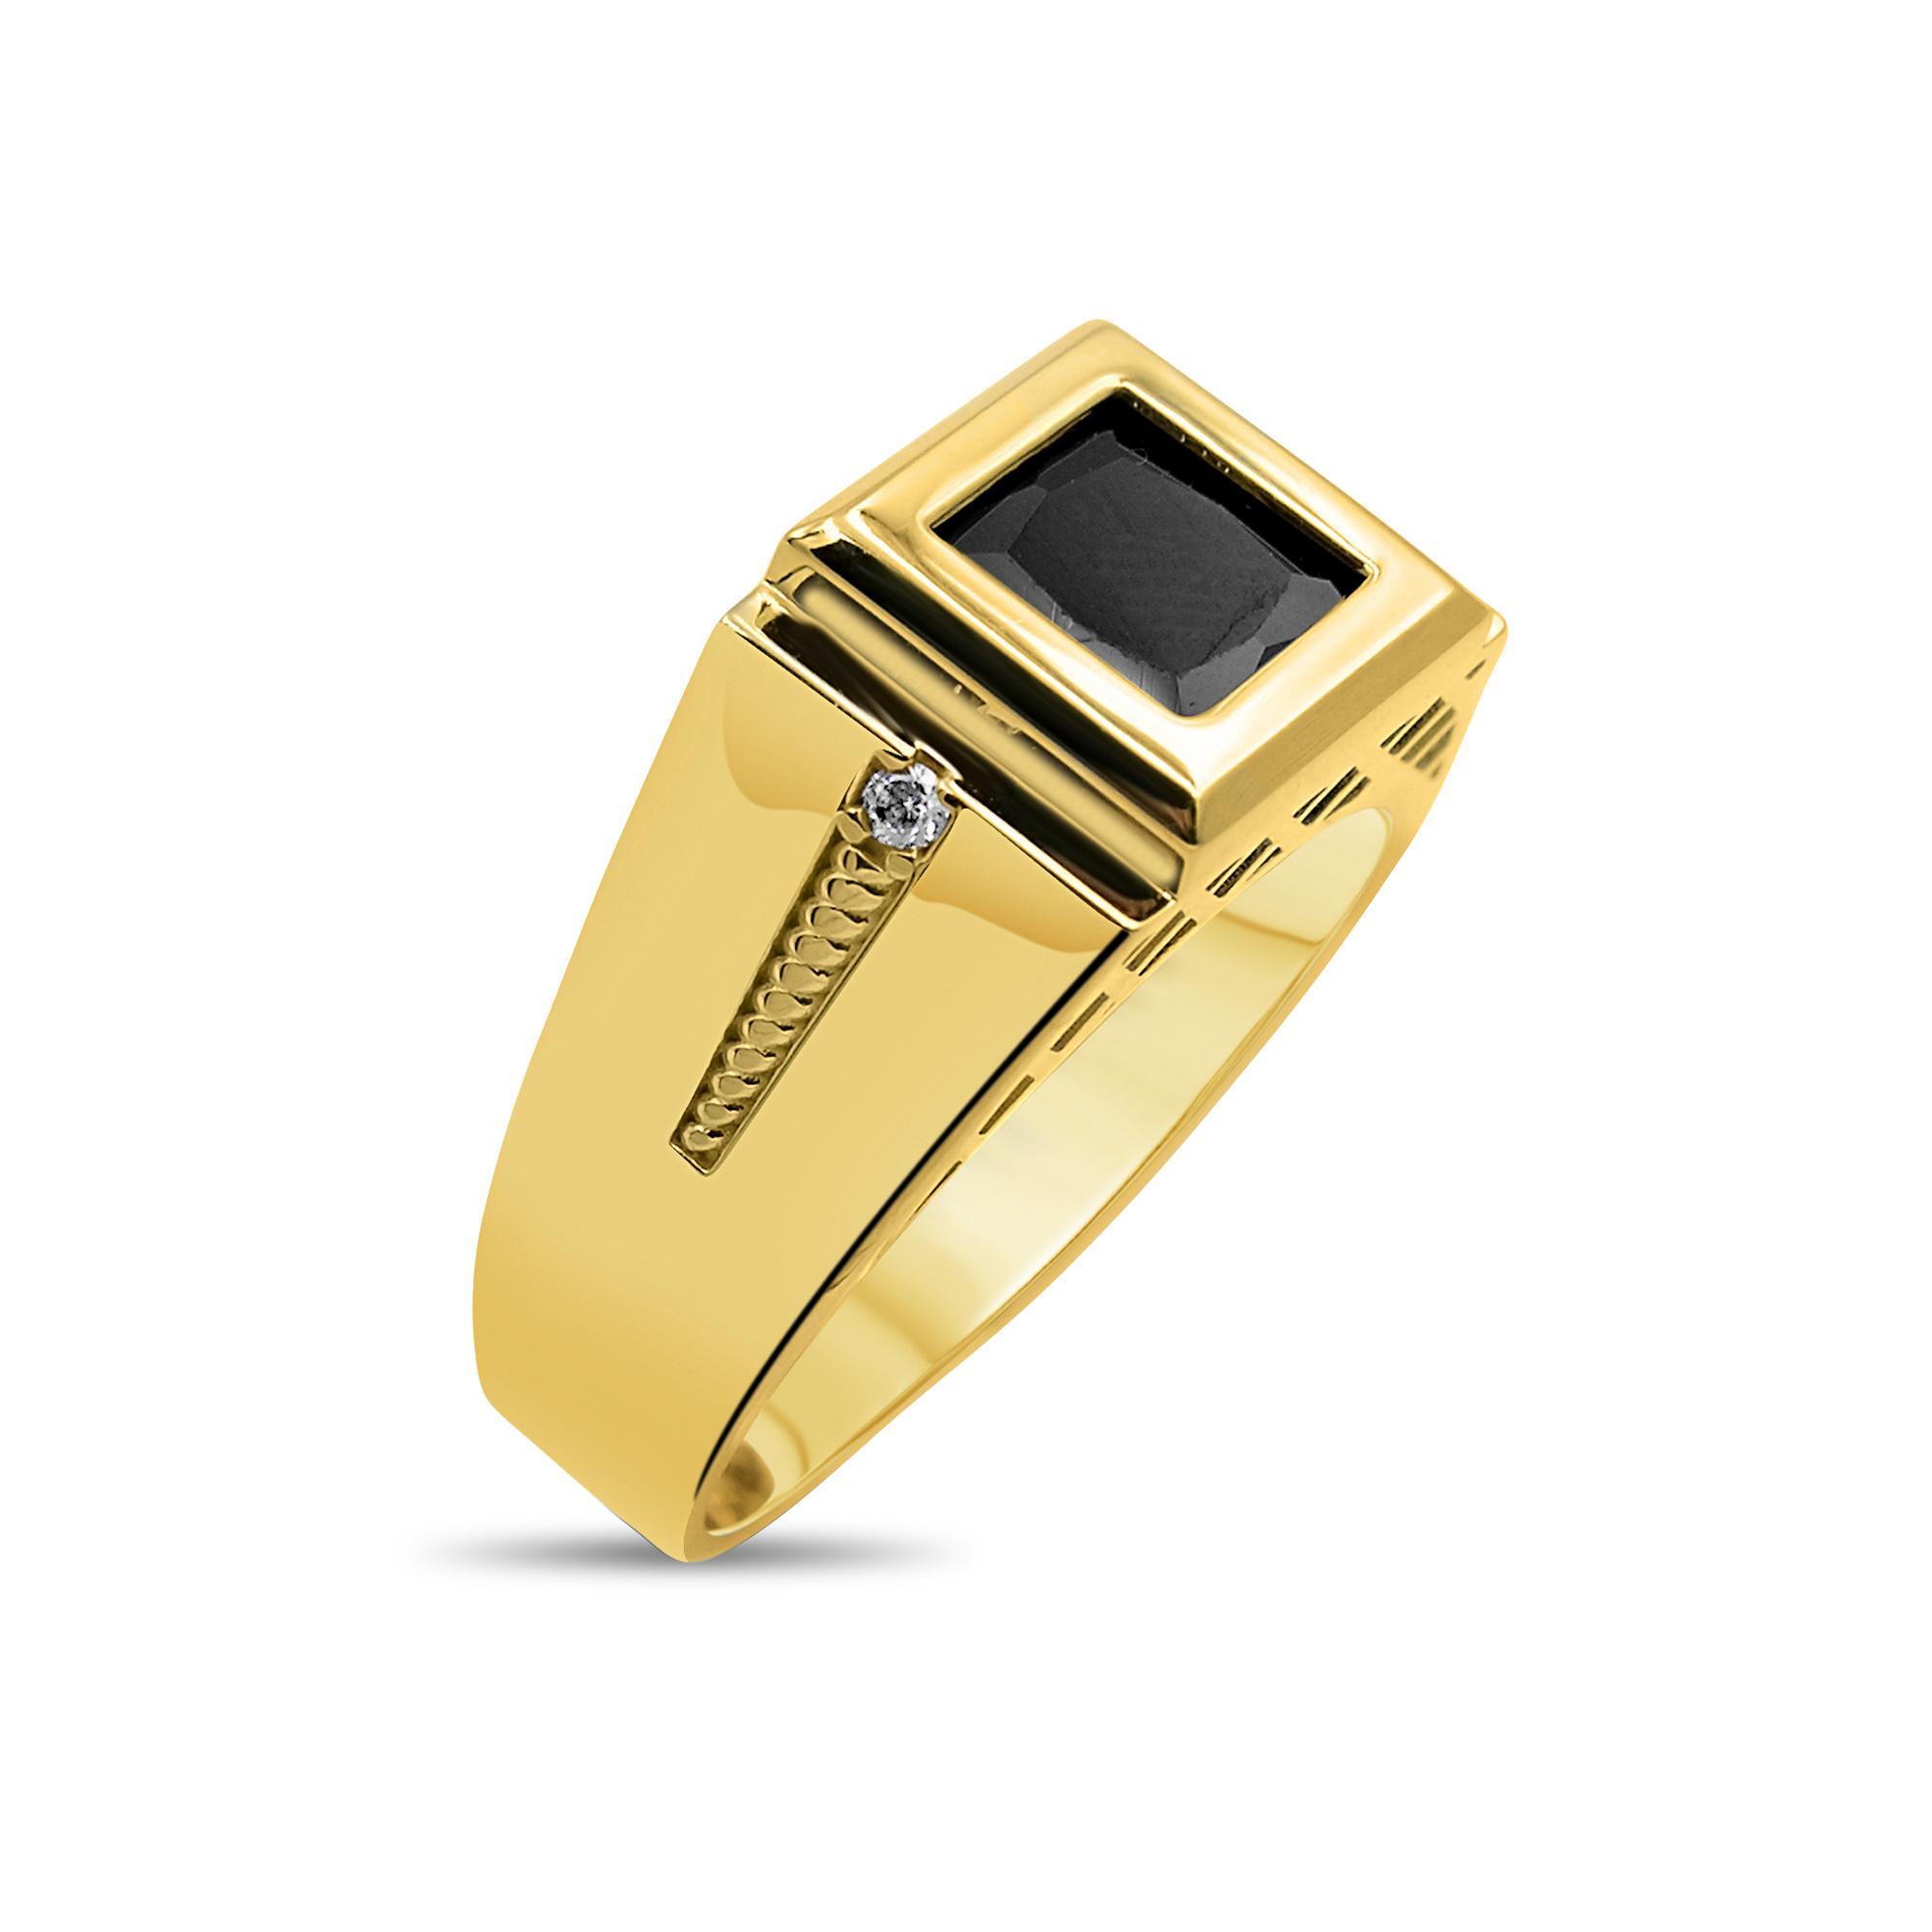 18 kt yellow gold men's ring with onyx & zirconia